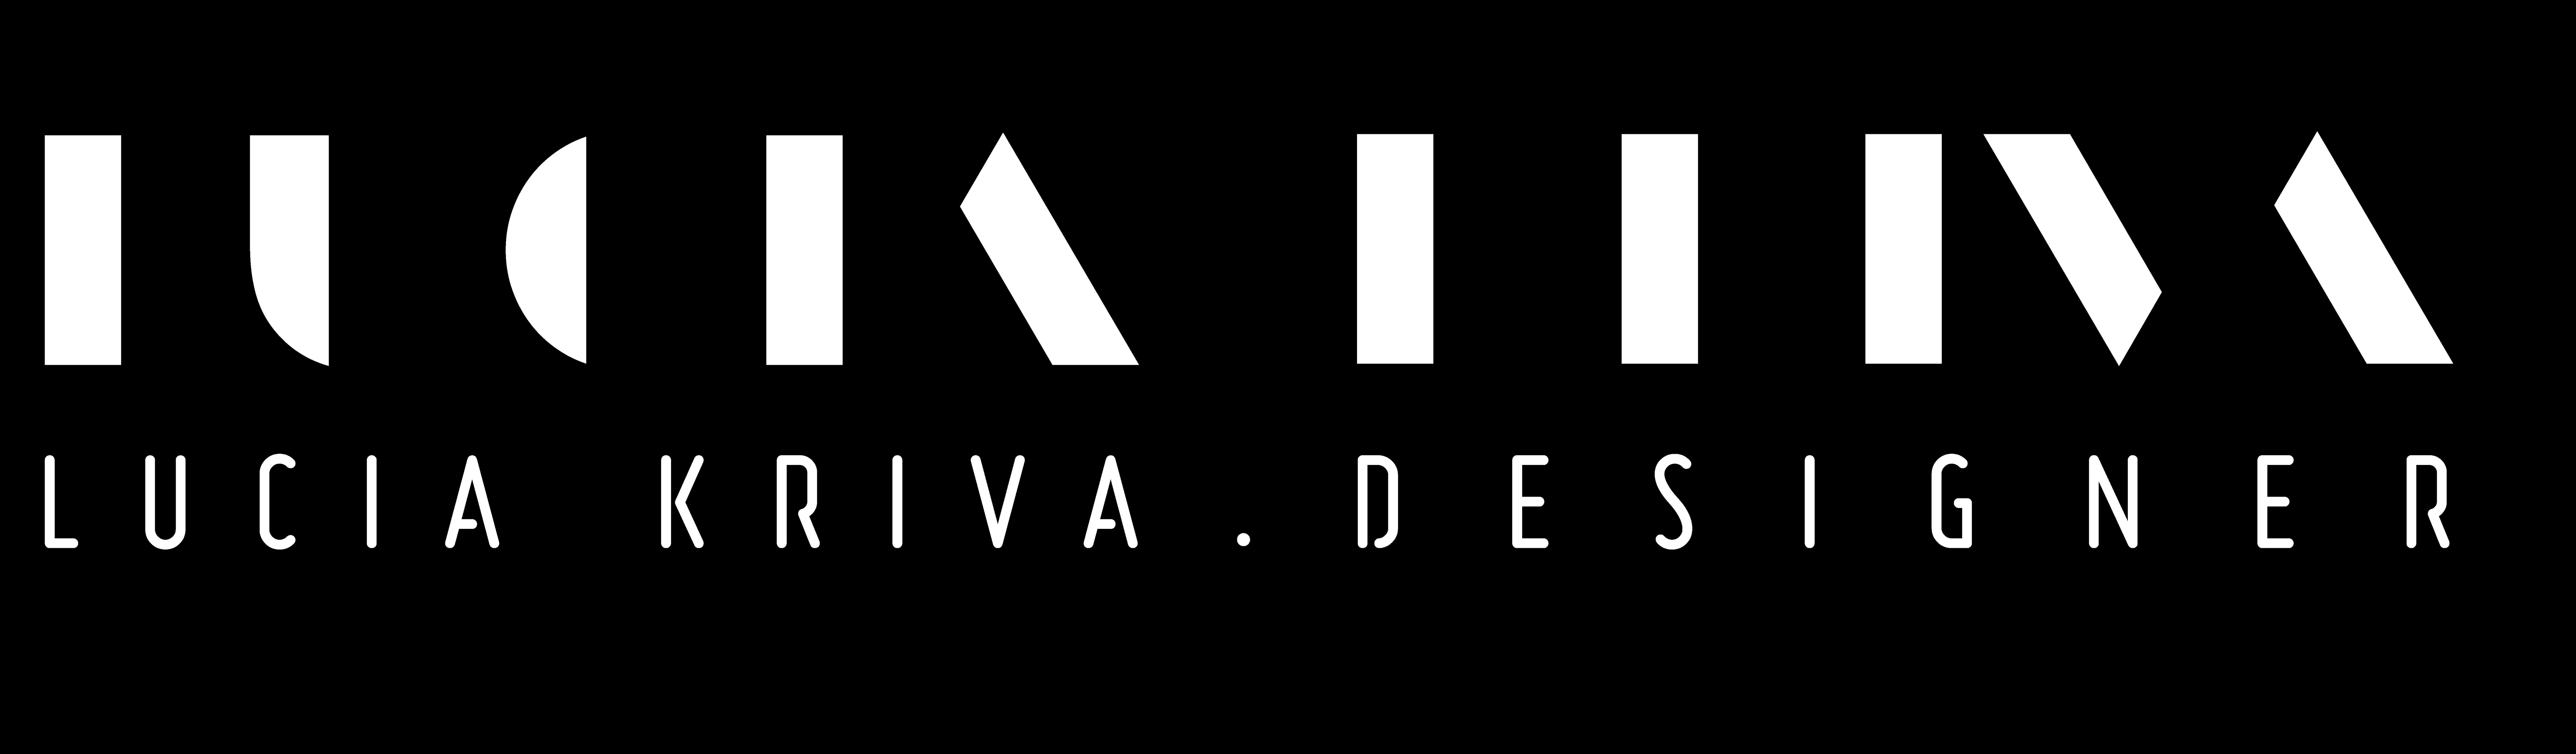 Lucia Krivá designer